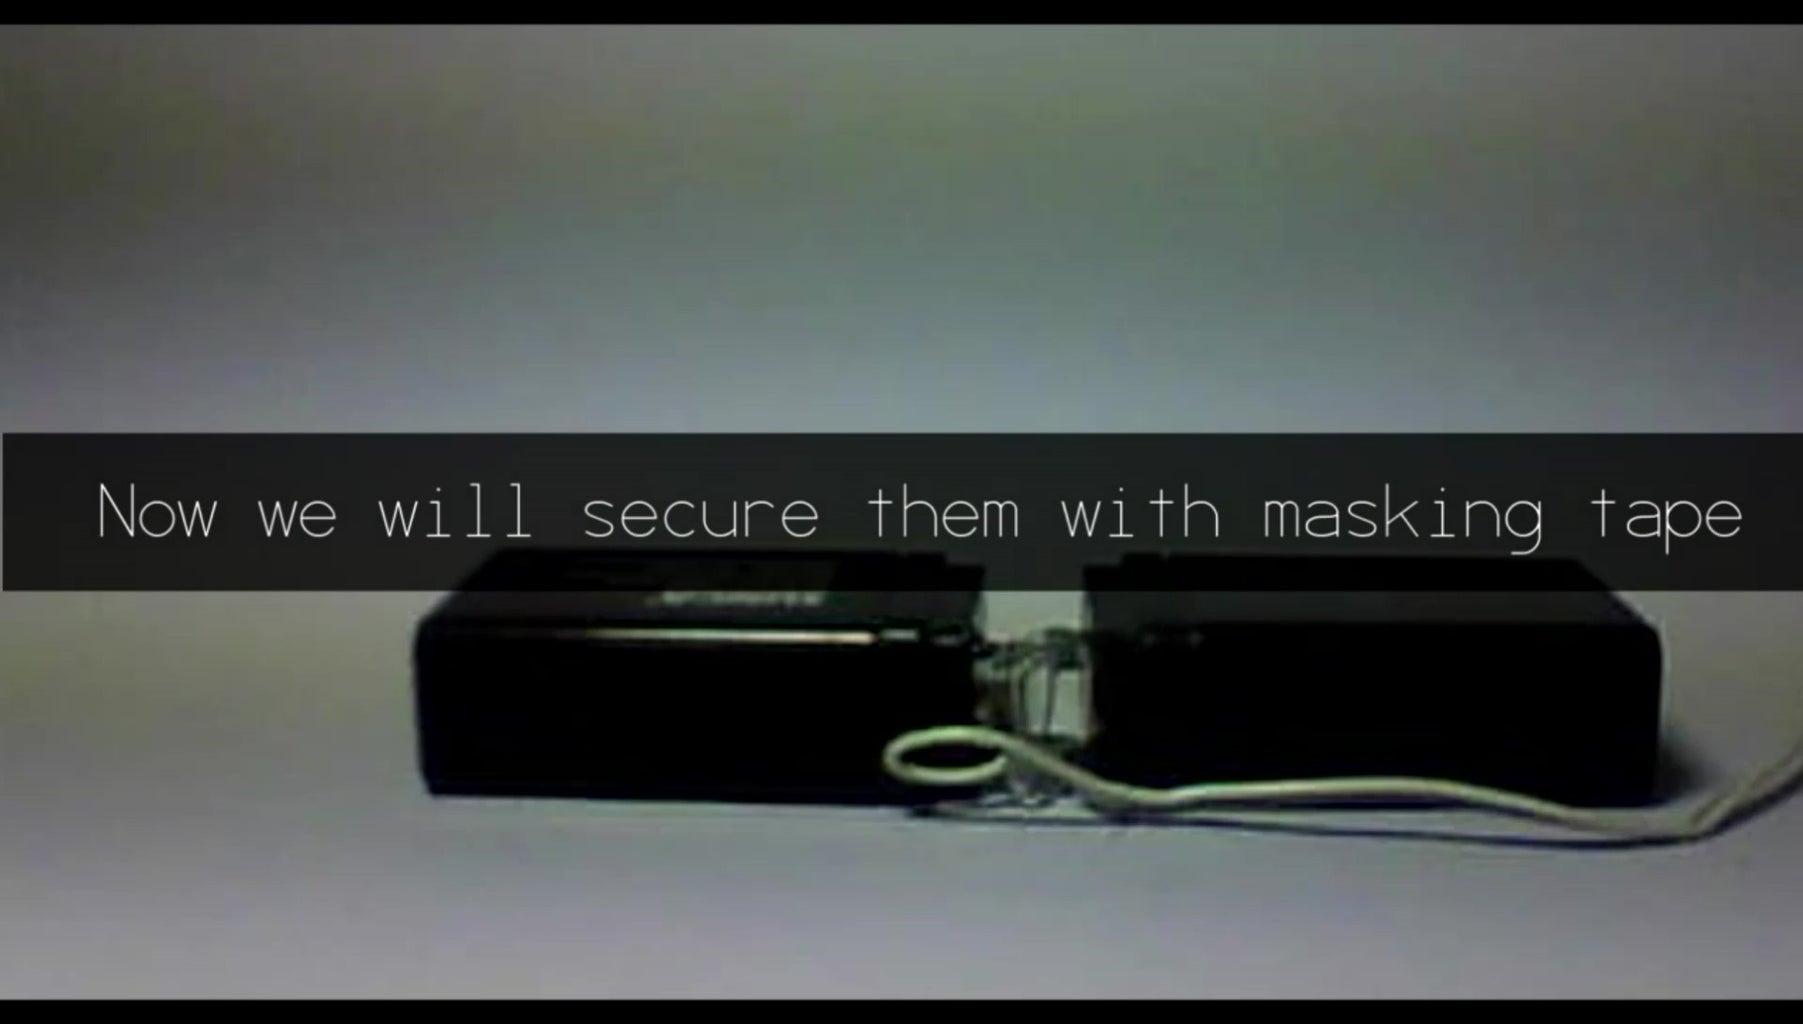 Securing Them.